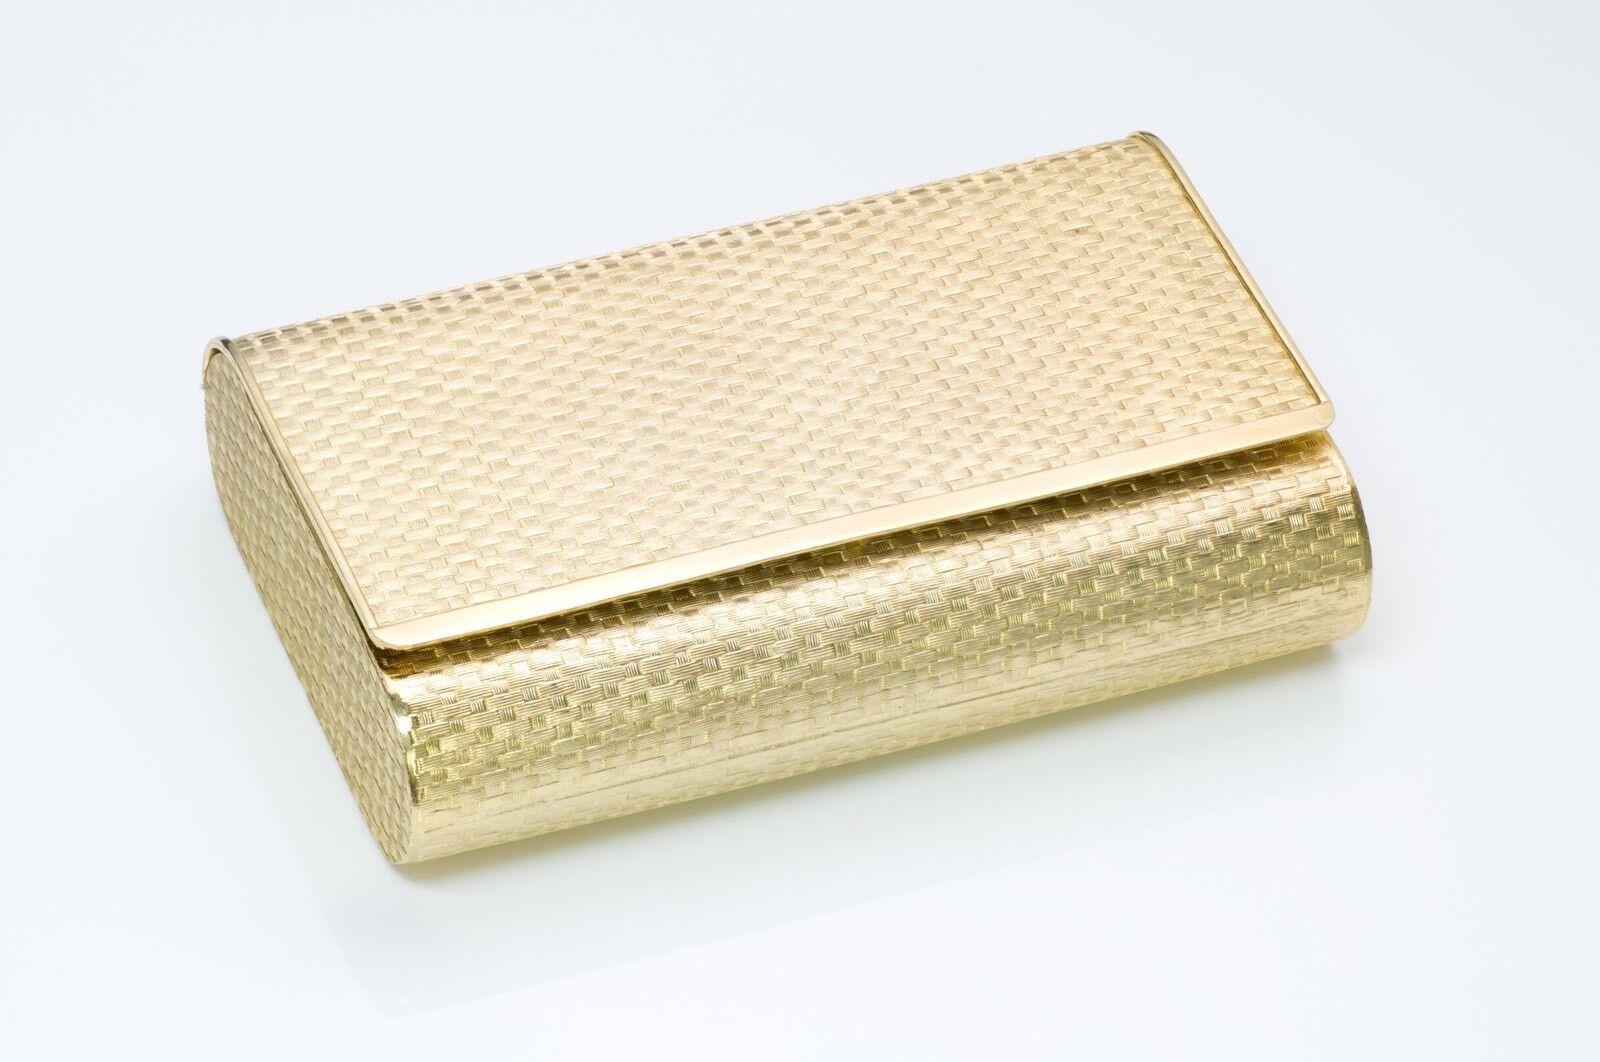 Lanvin 1970's Gold Tone Metal Clutch - image 1